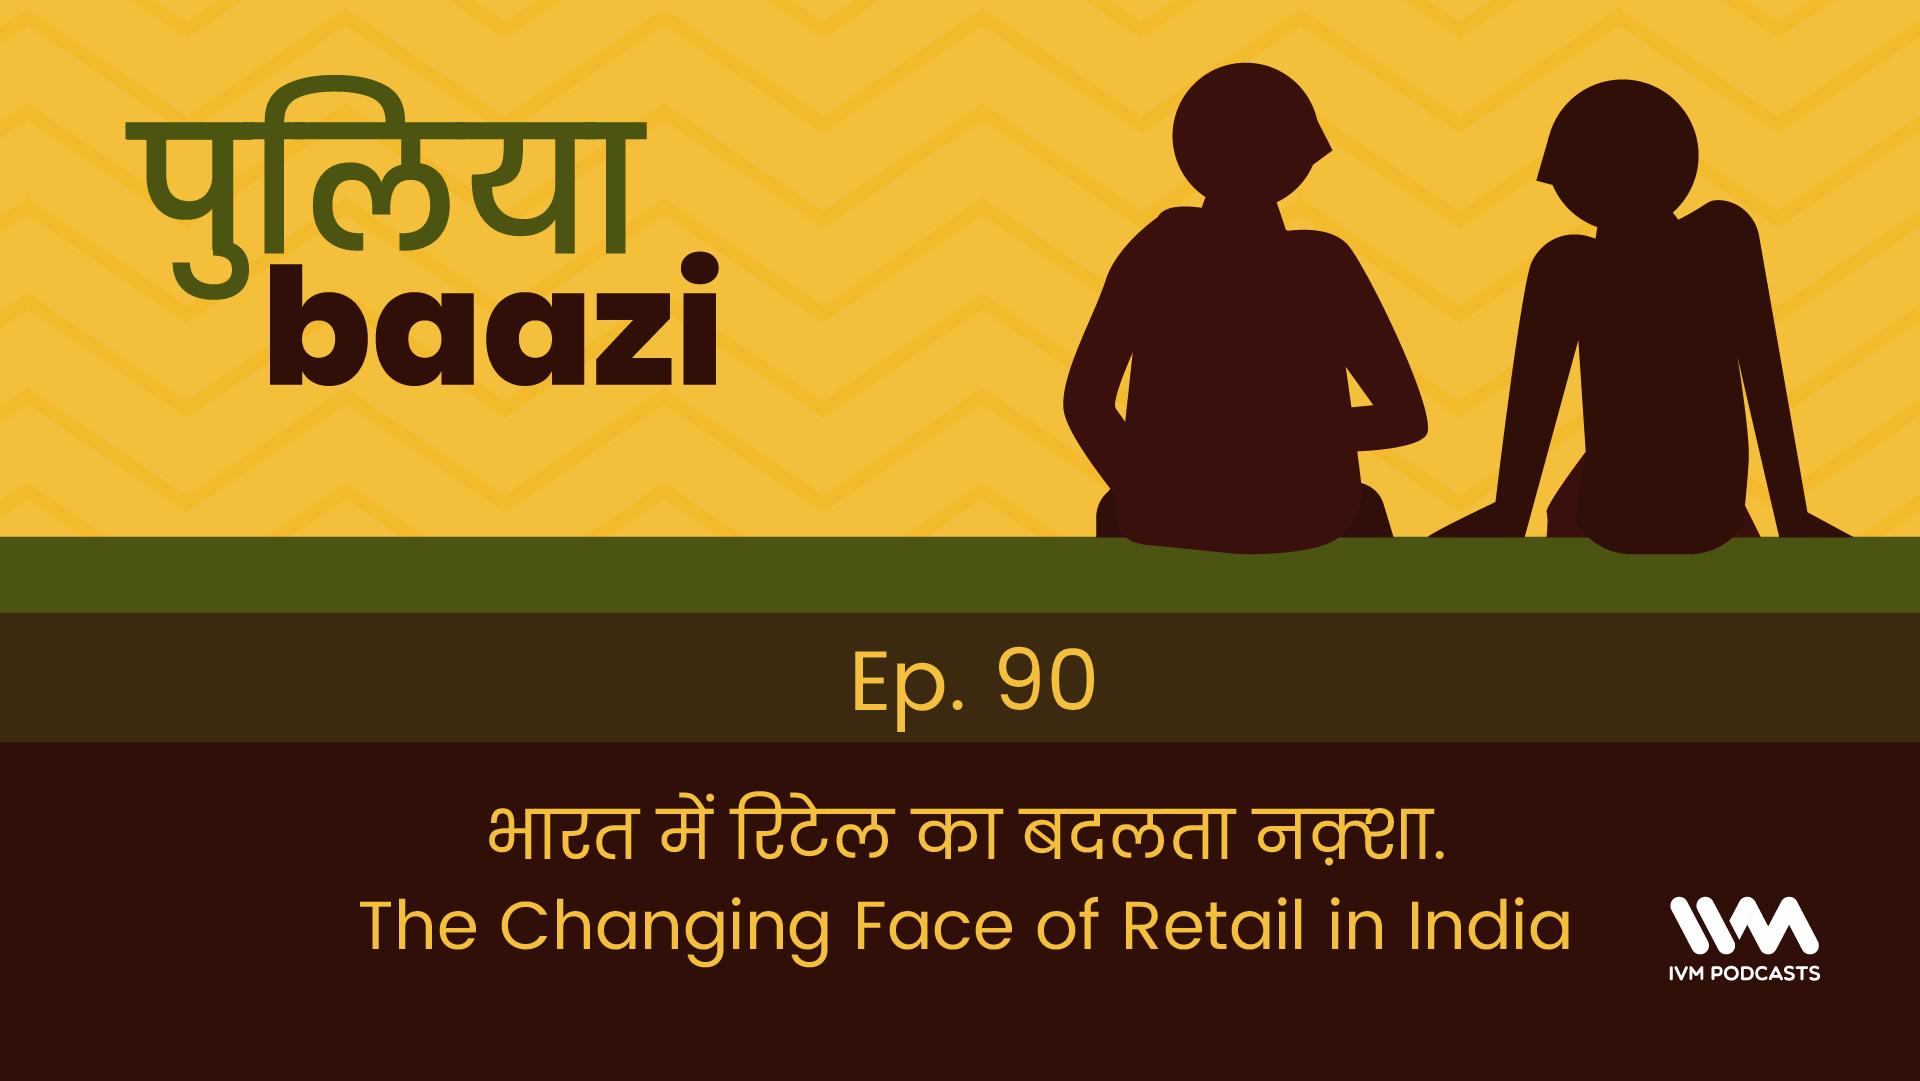 भारत में रिटेल का बदलता नक़्शा. The Changing Face of Retail in India